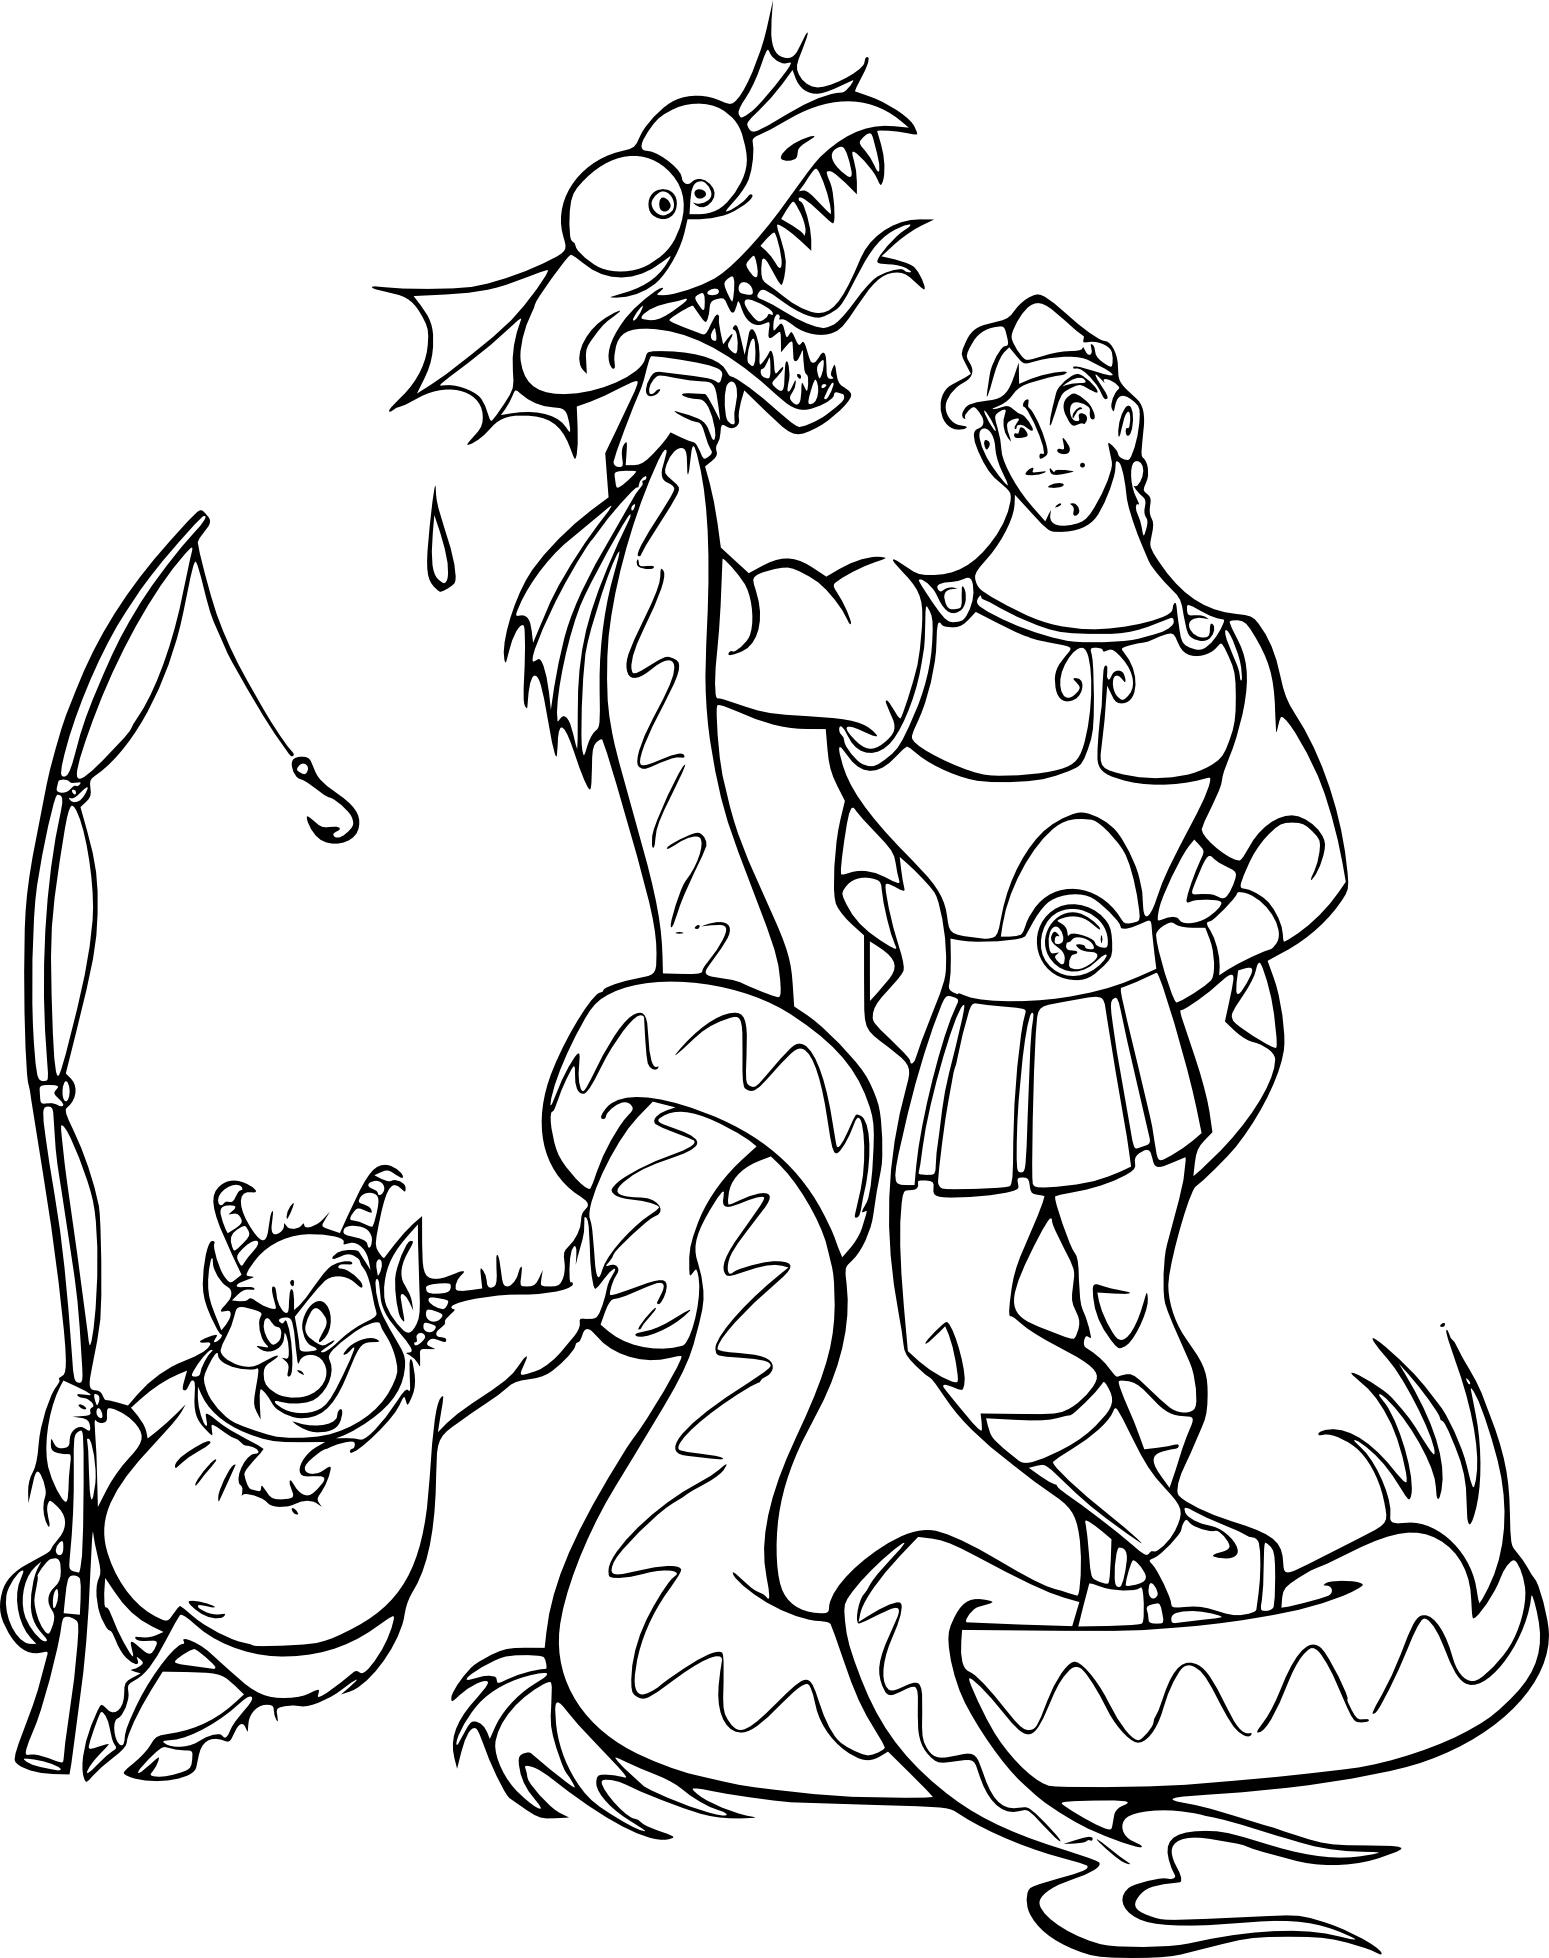 Coloriage Hercule demi-dieu